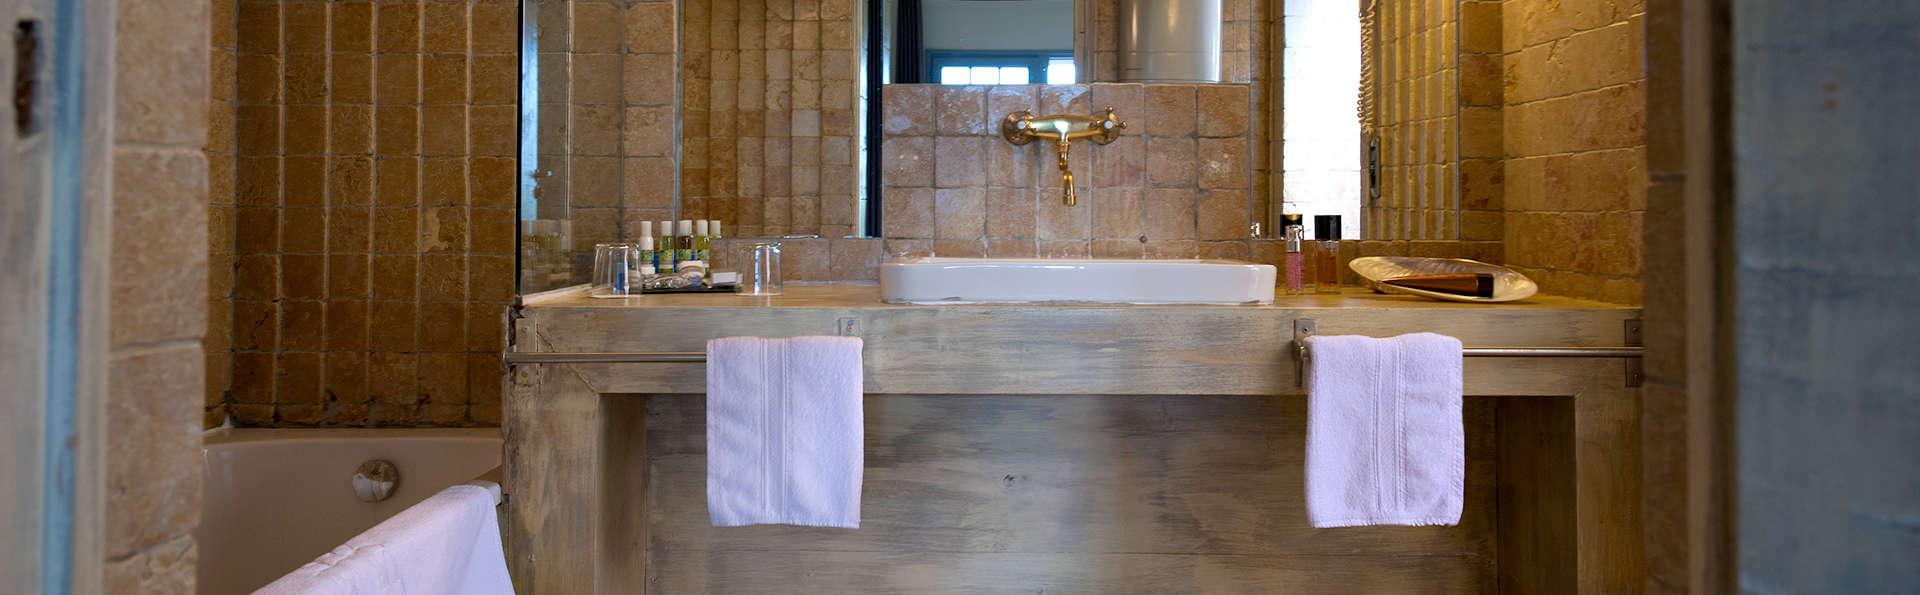 Les Arnelles - Edit_Bathroom.jpg